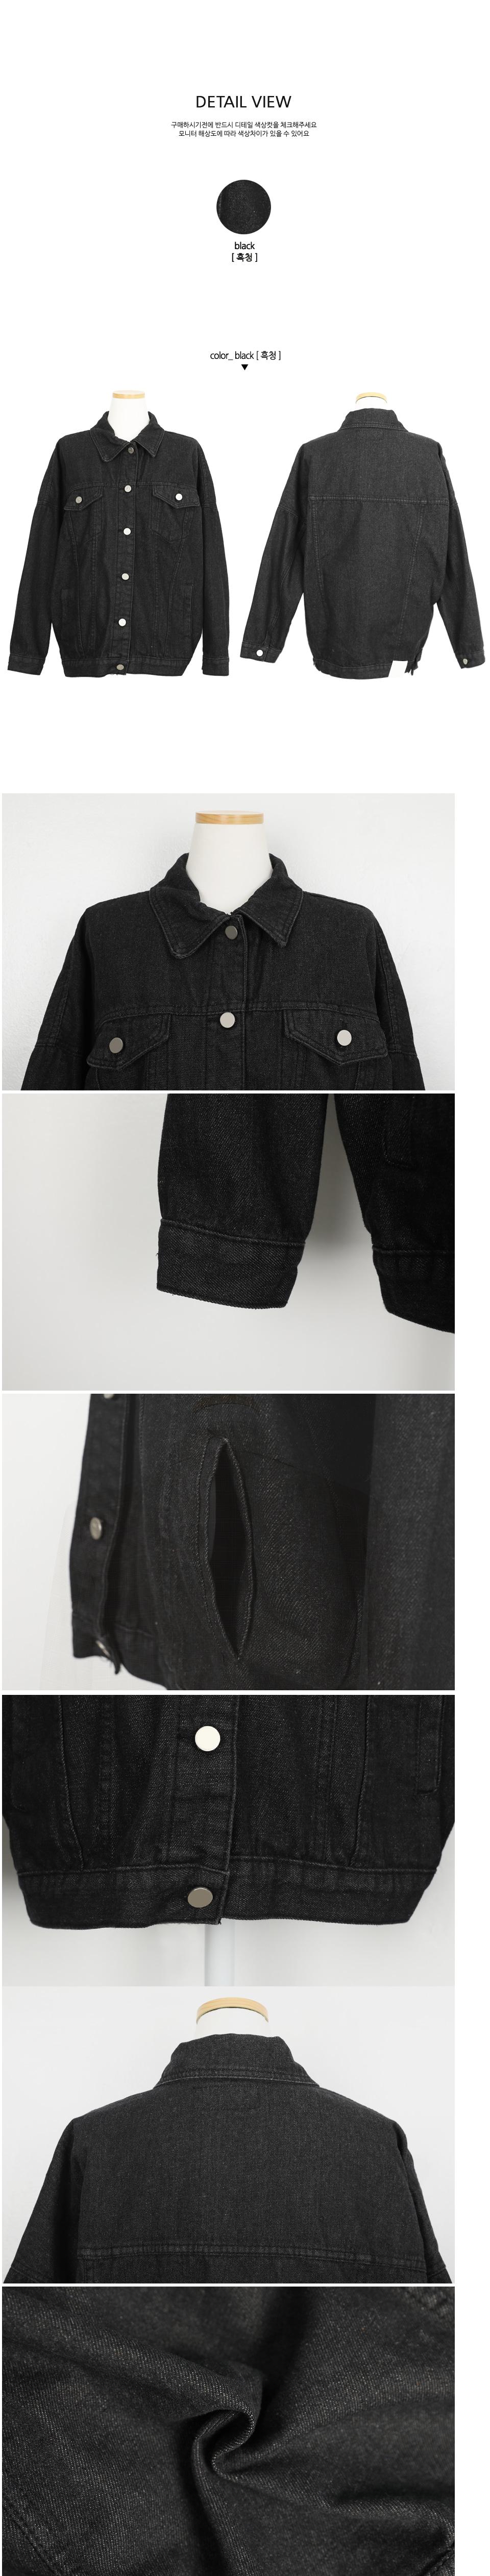 Touched Black Cheek Jacket